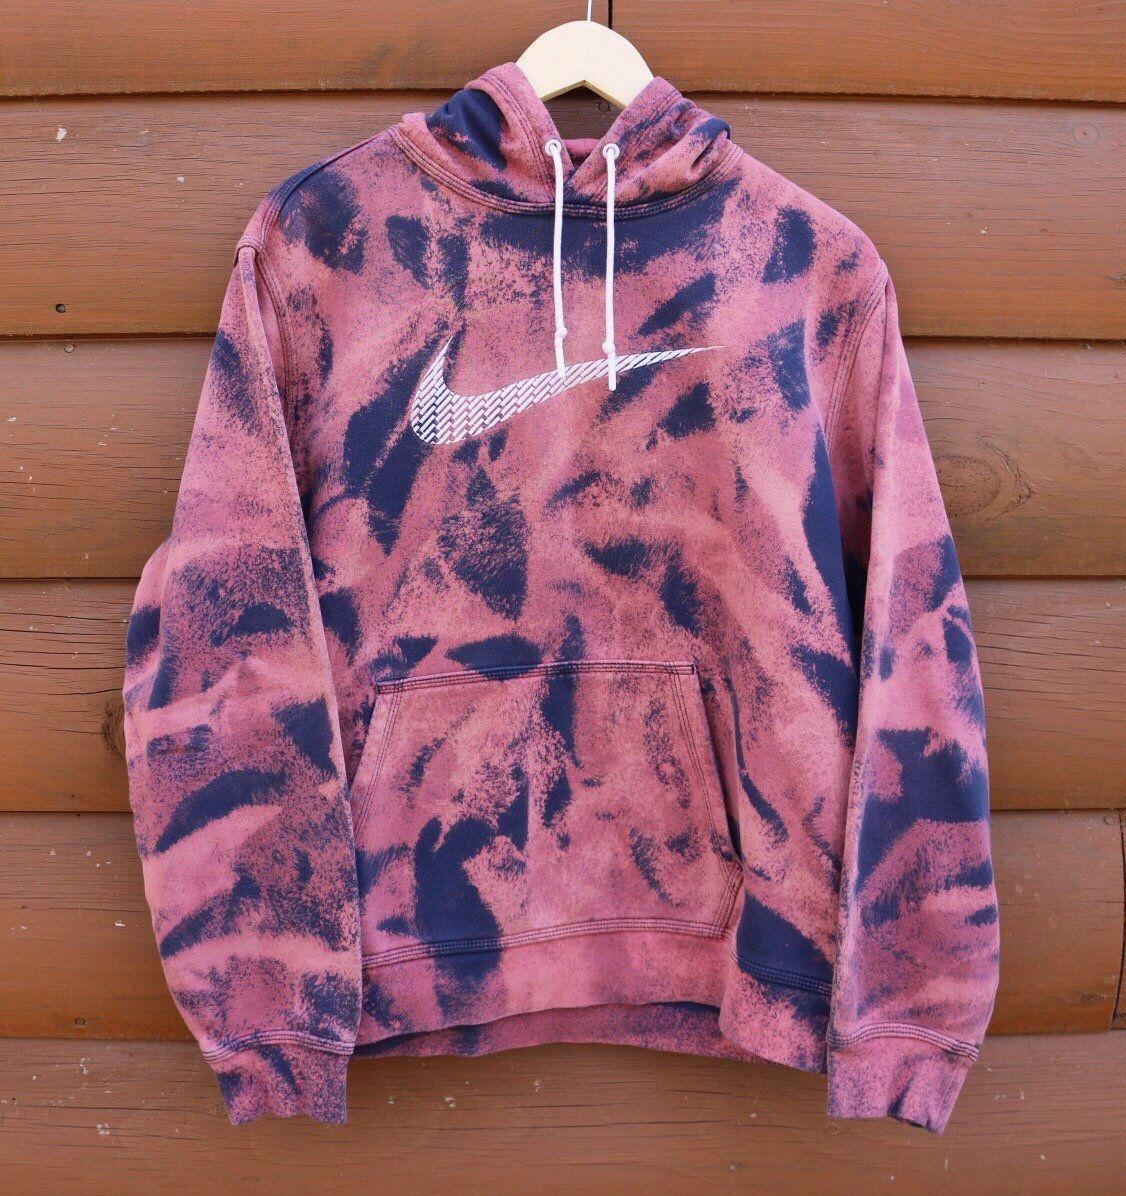 2dc64f94 Nike Hoodie Custom Bleached Purple Pink and Blue Acid Wash Sweatshirt by  ScarlettThreadz on Etsy https